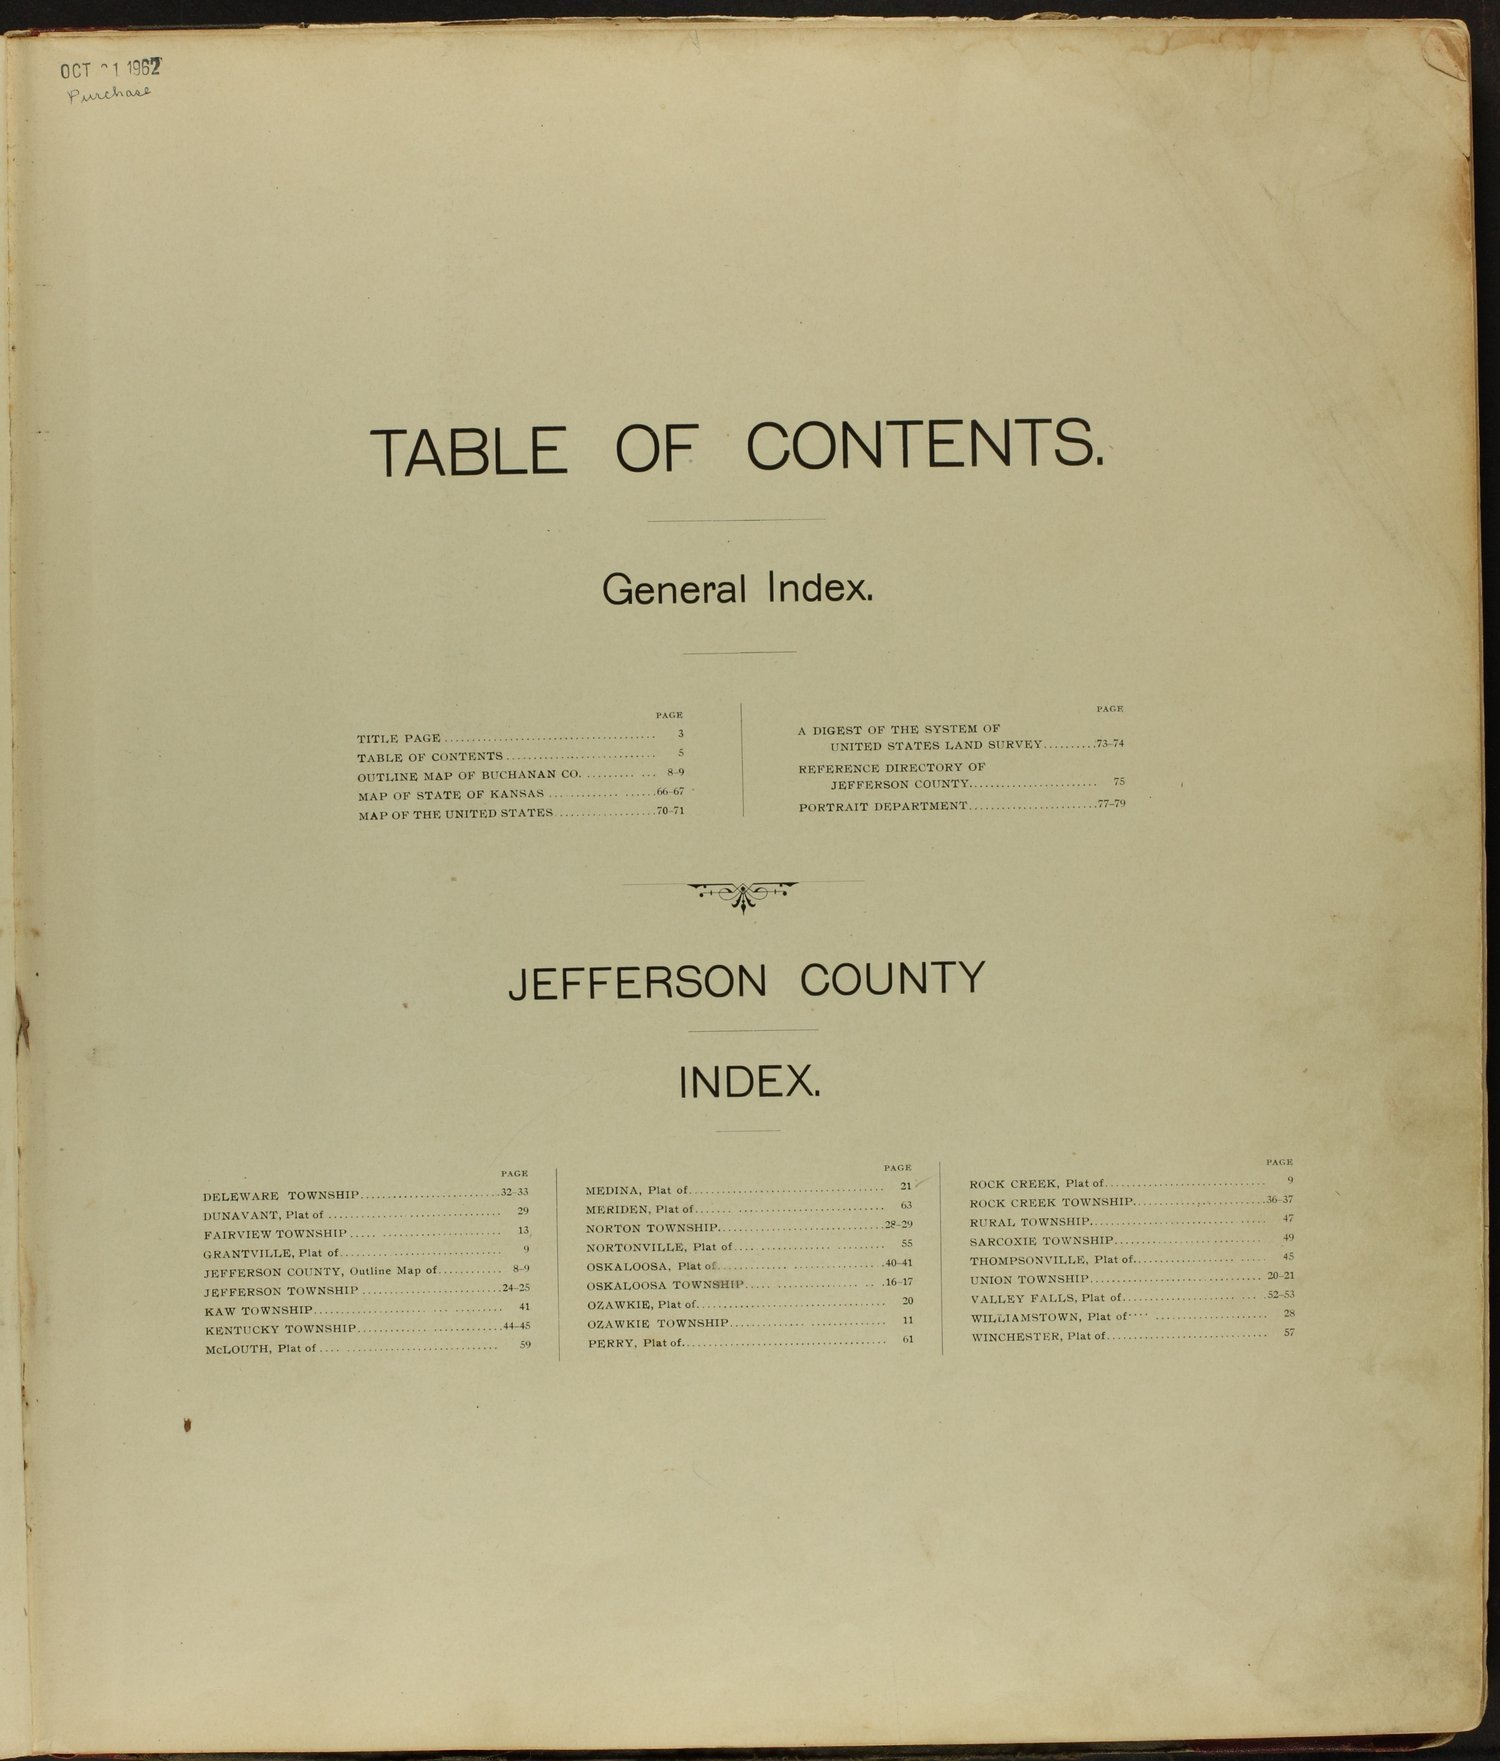 Descriptive atlas of Jefferson County, Kansas - Table of Contents